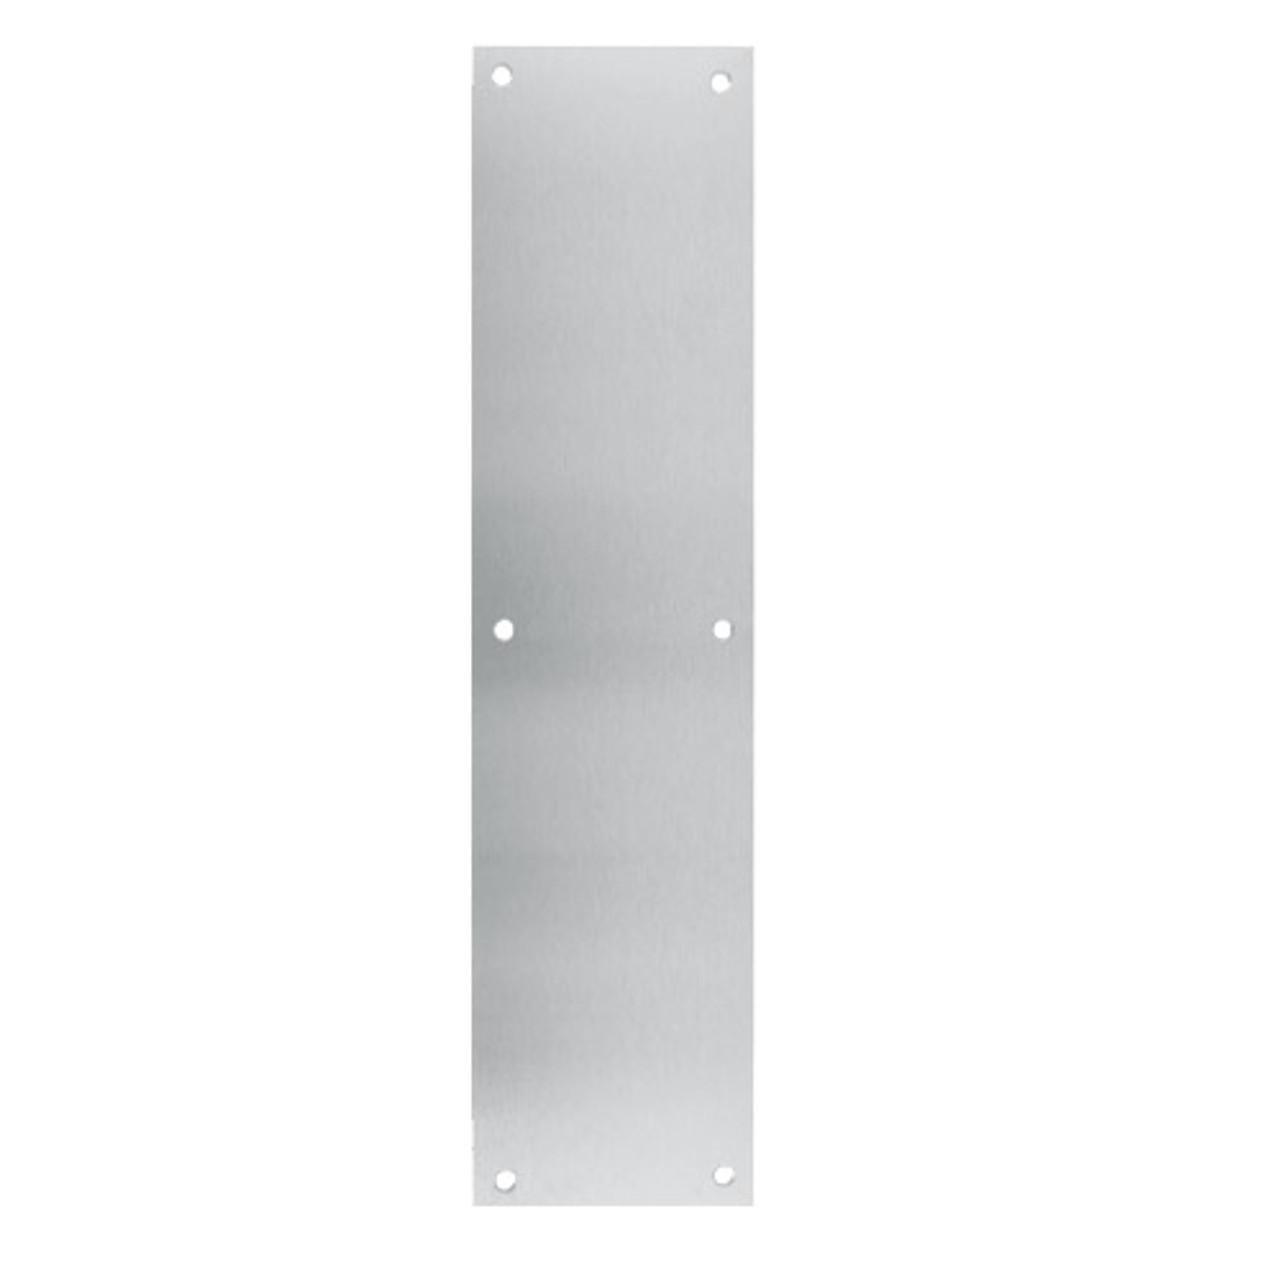 73-628 Don Jo 0.50 Push Plate in Aluminum Finish